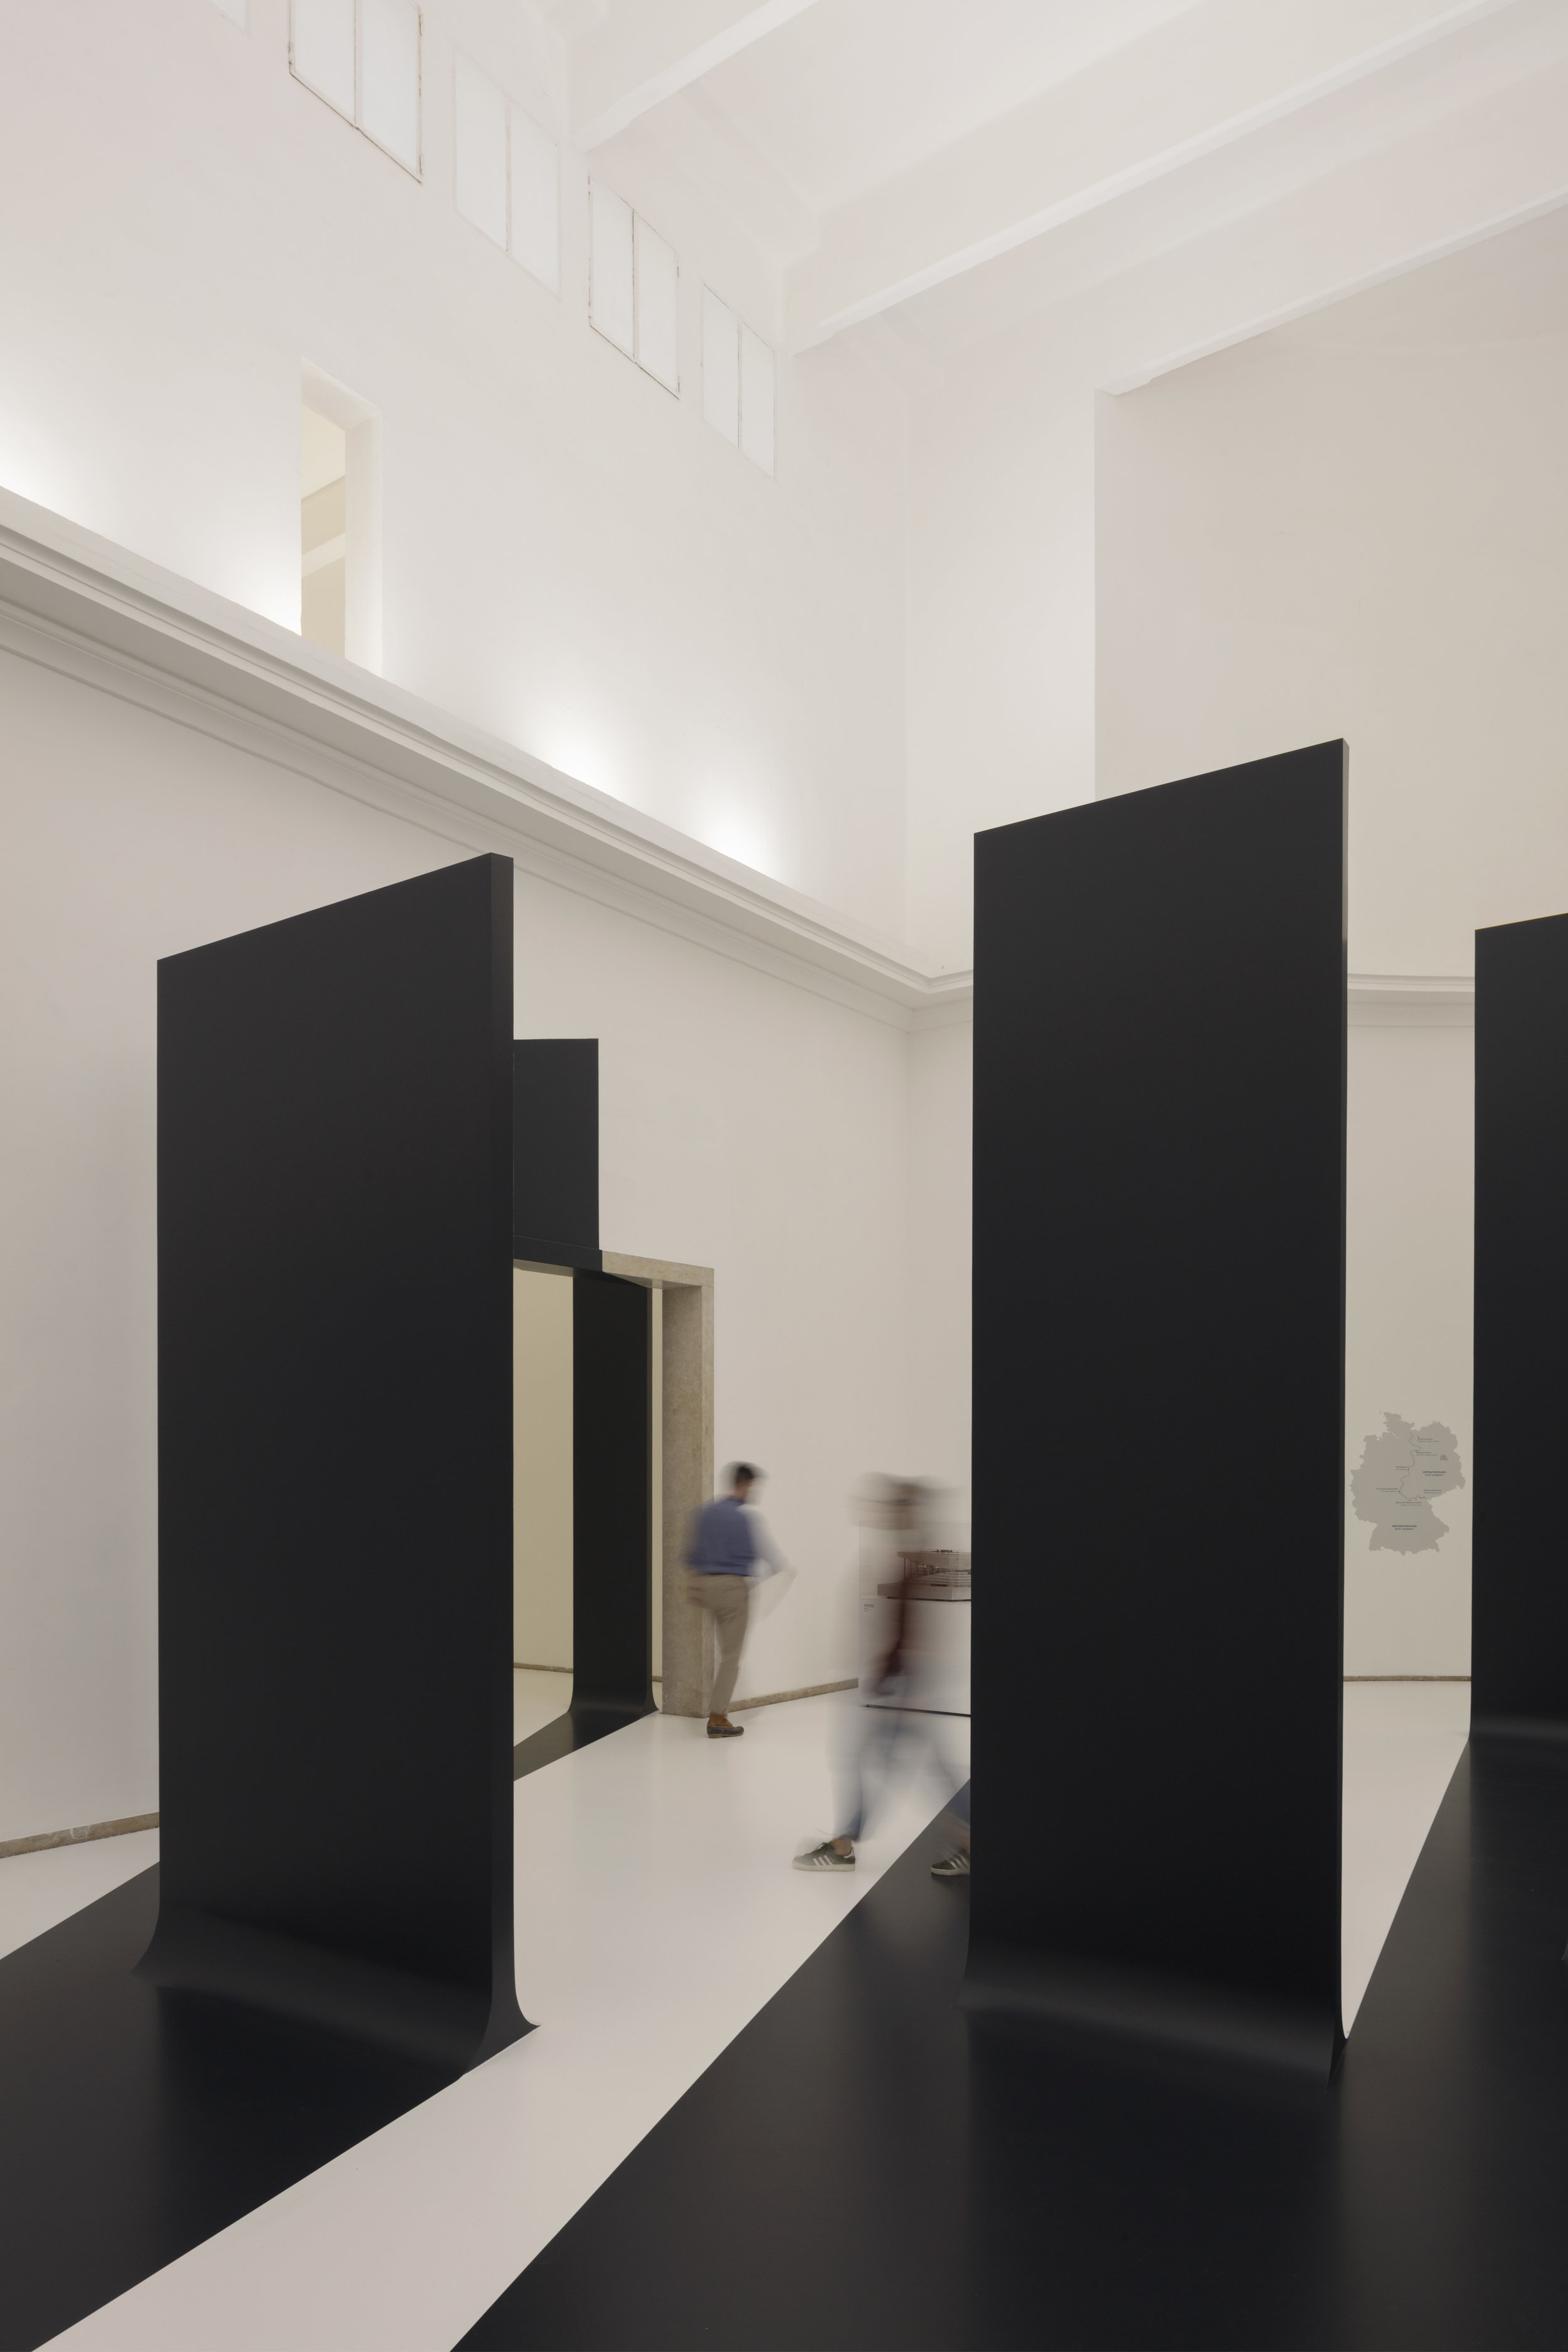 13_German Pavilion_Biennale Architettura 2018_c_Jan Bitter.jpg